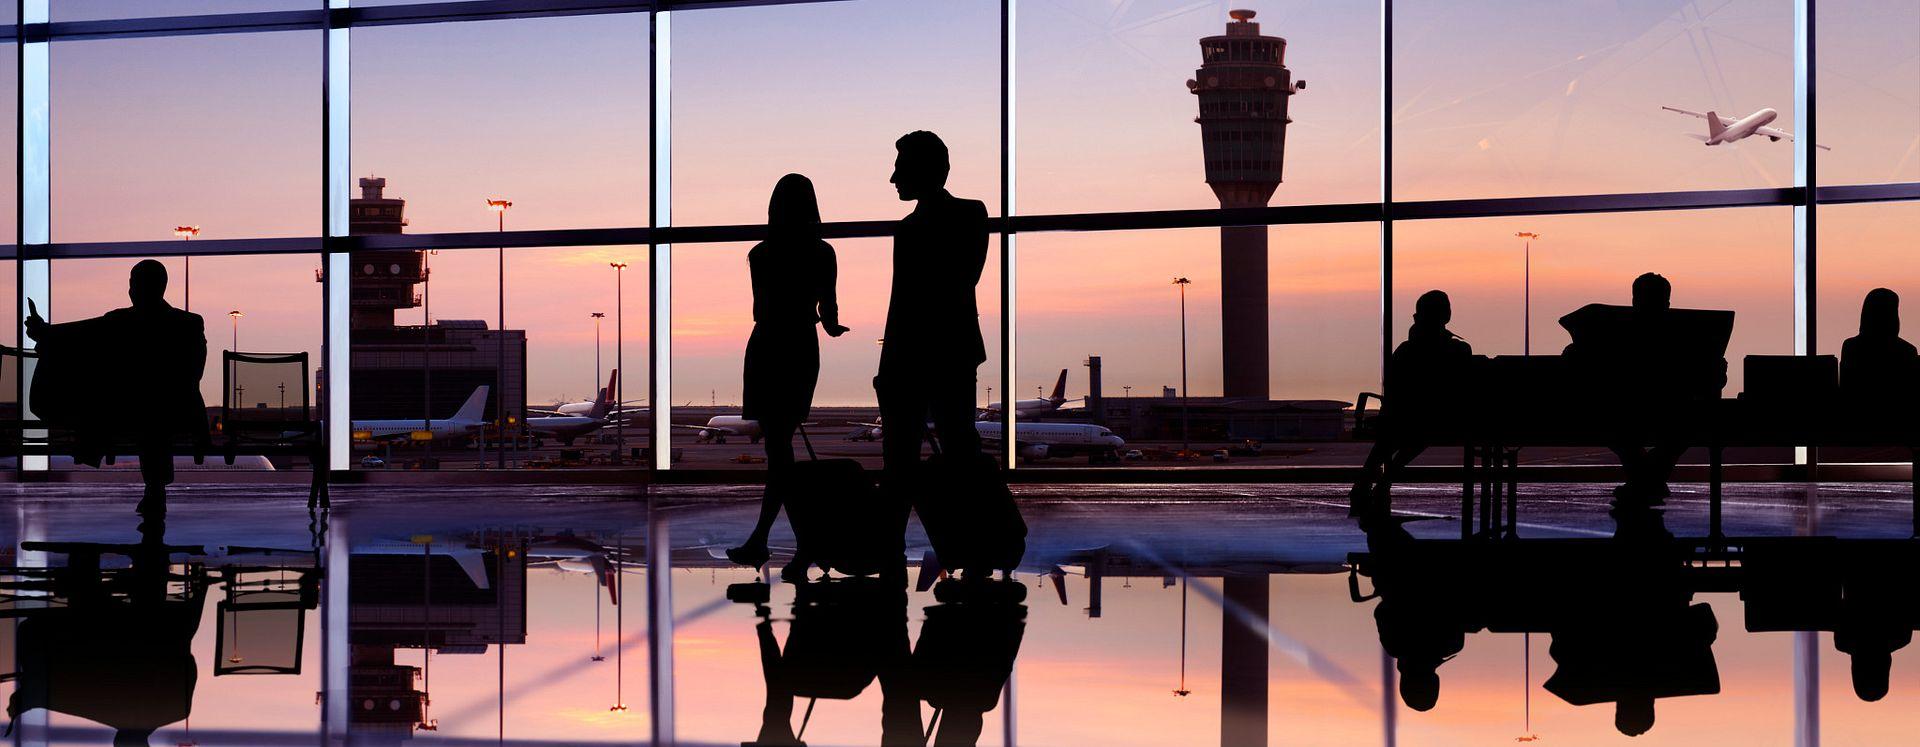 Viajantes dentro do Aeroporto Internacional de Orlando